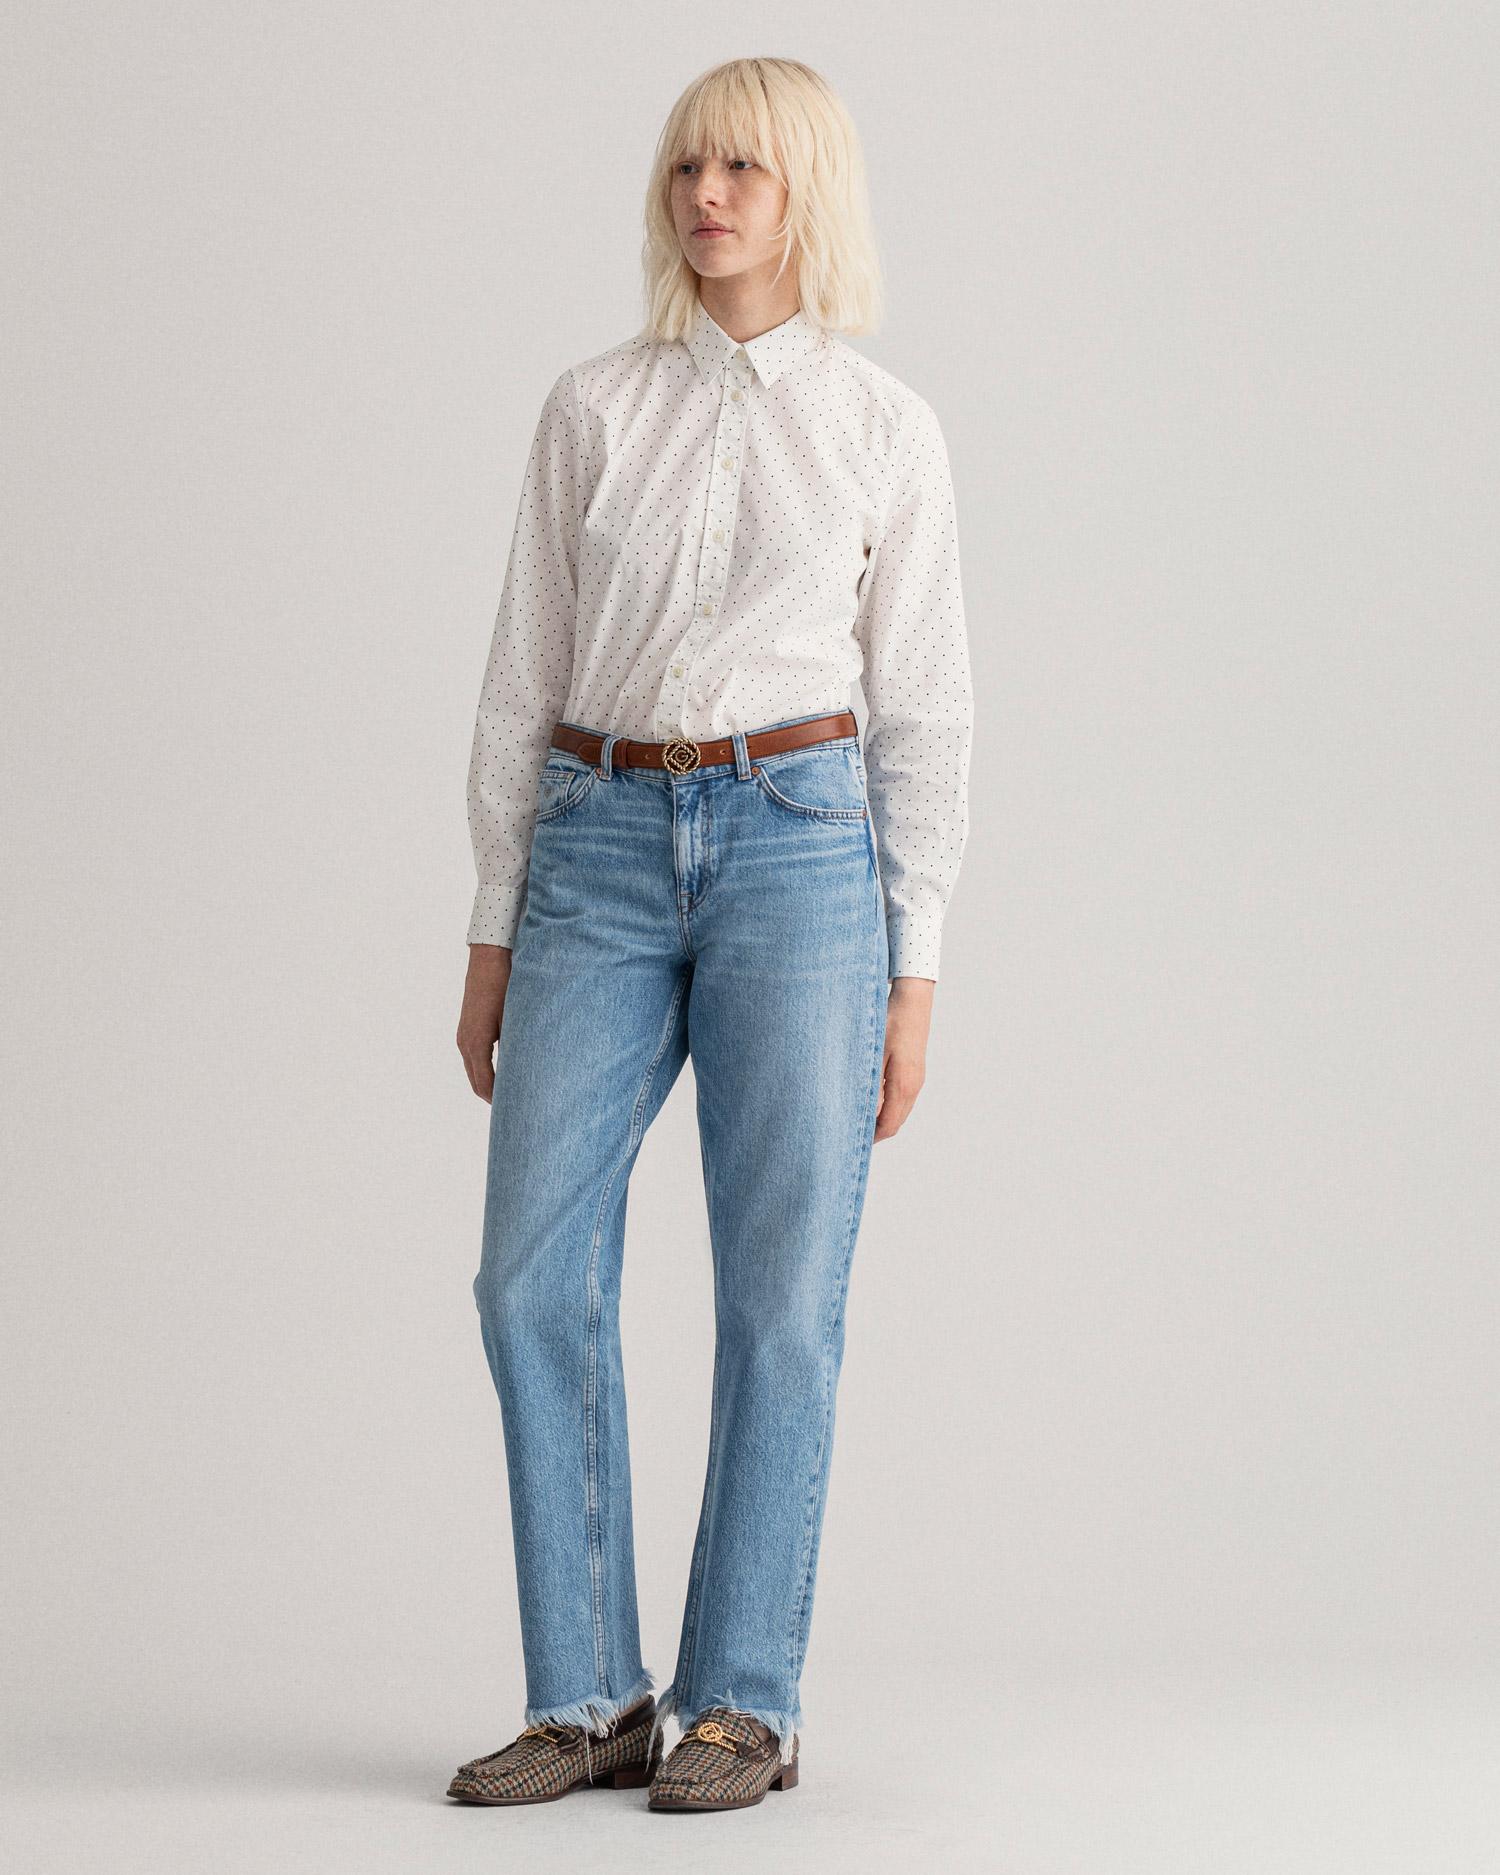 GANT damska koszula z sukna z motywem Polka Dot Regular Fit Tech Prep™ - 4311220